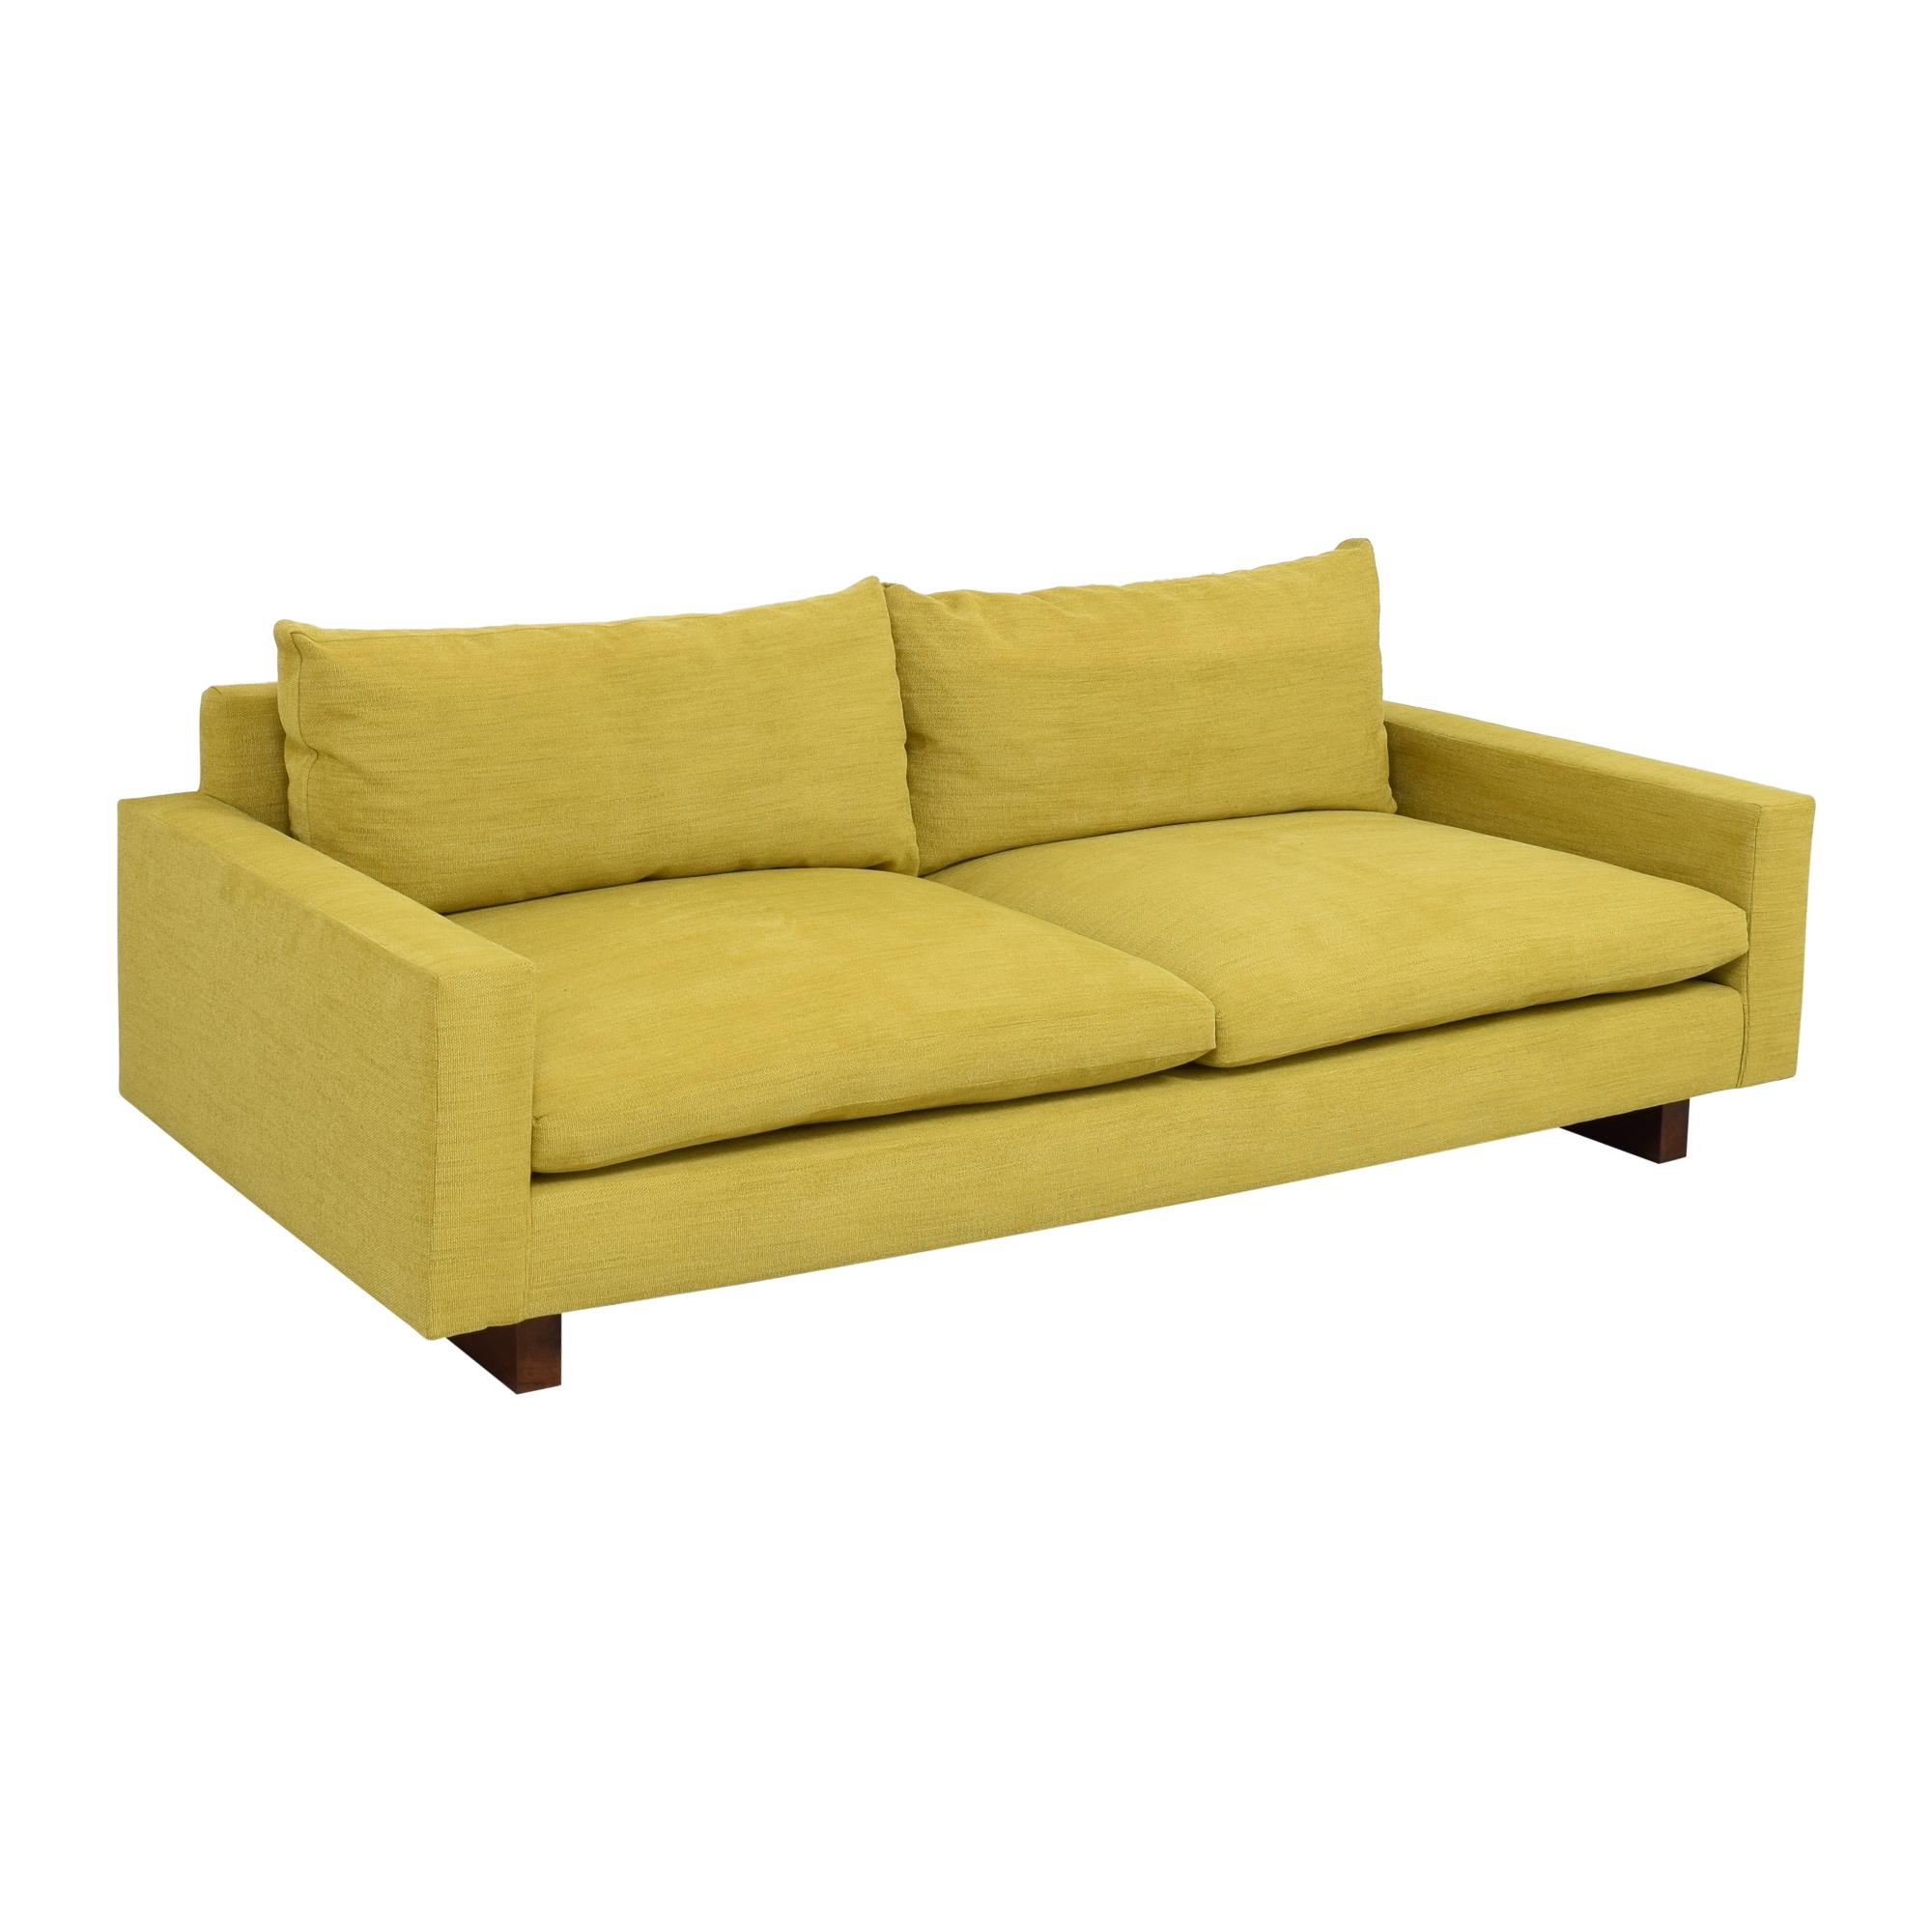 West Elm West Elm Harmony Two Cushion Sofa